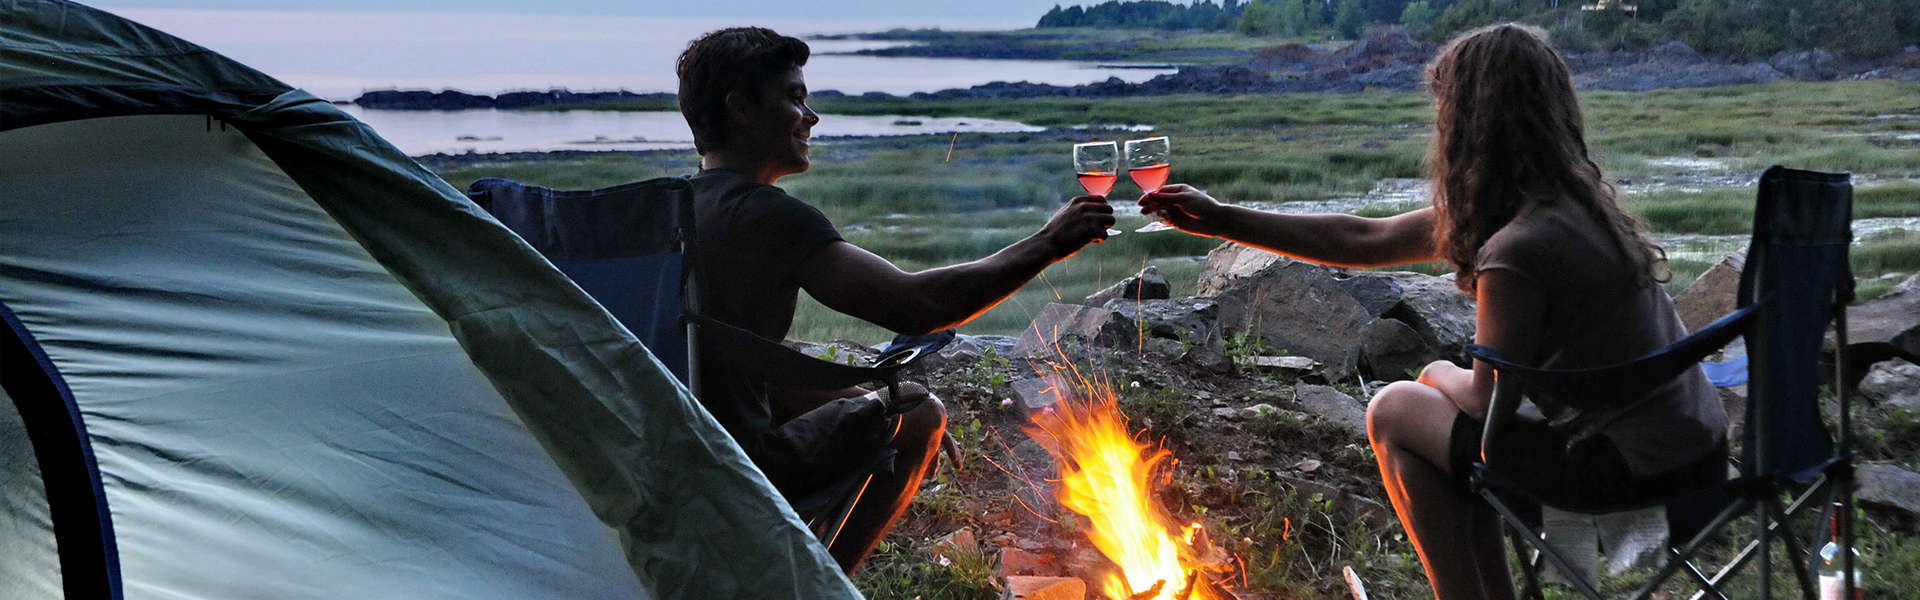 Camping De la Demi-lieue